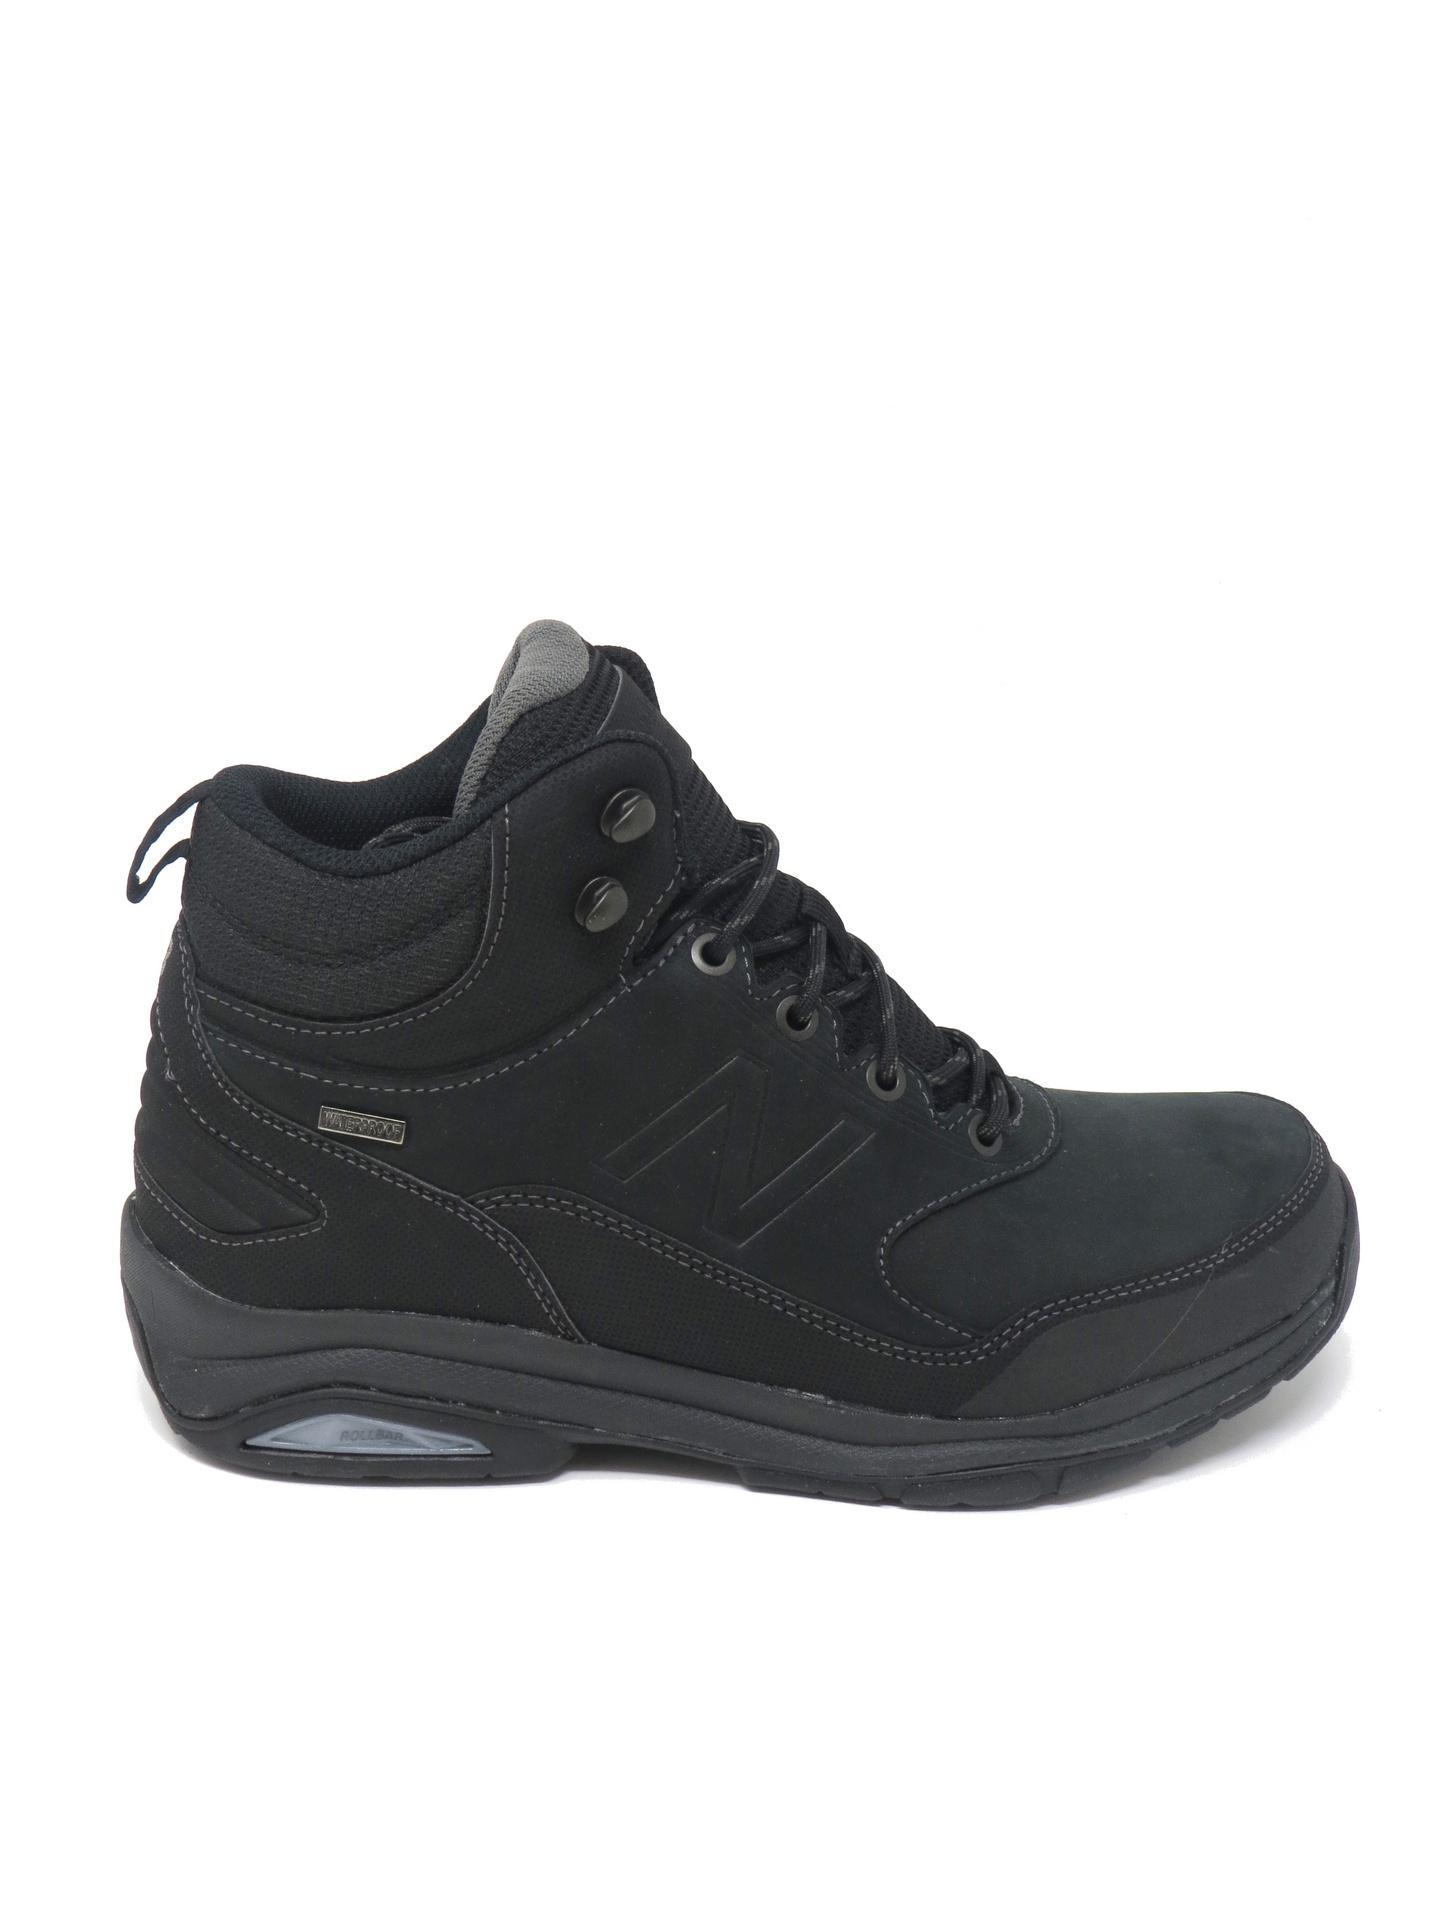 New Balance Men S  Trail Walker Shoes